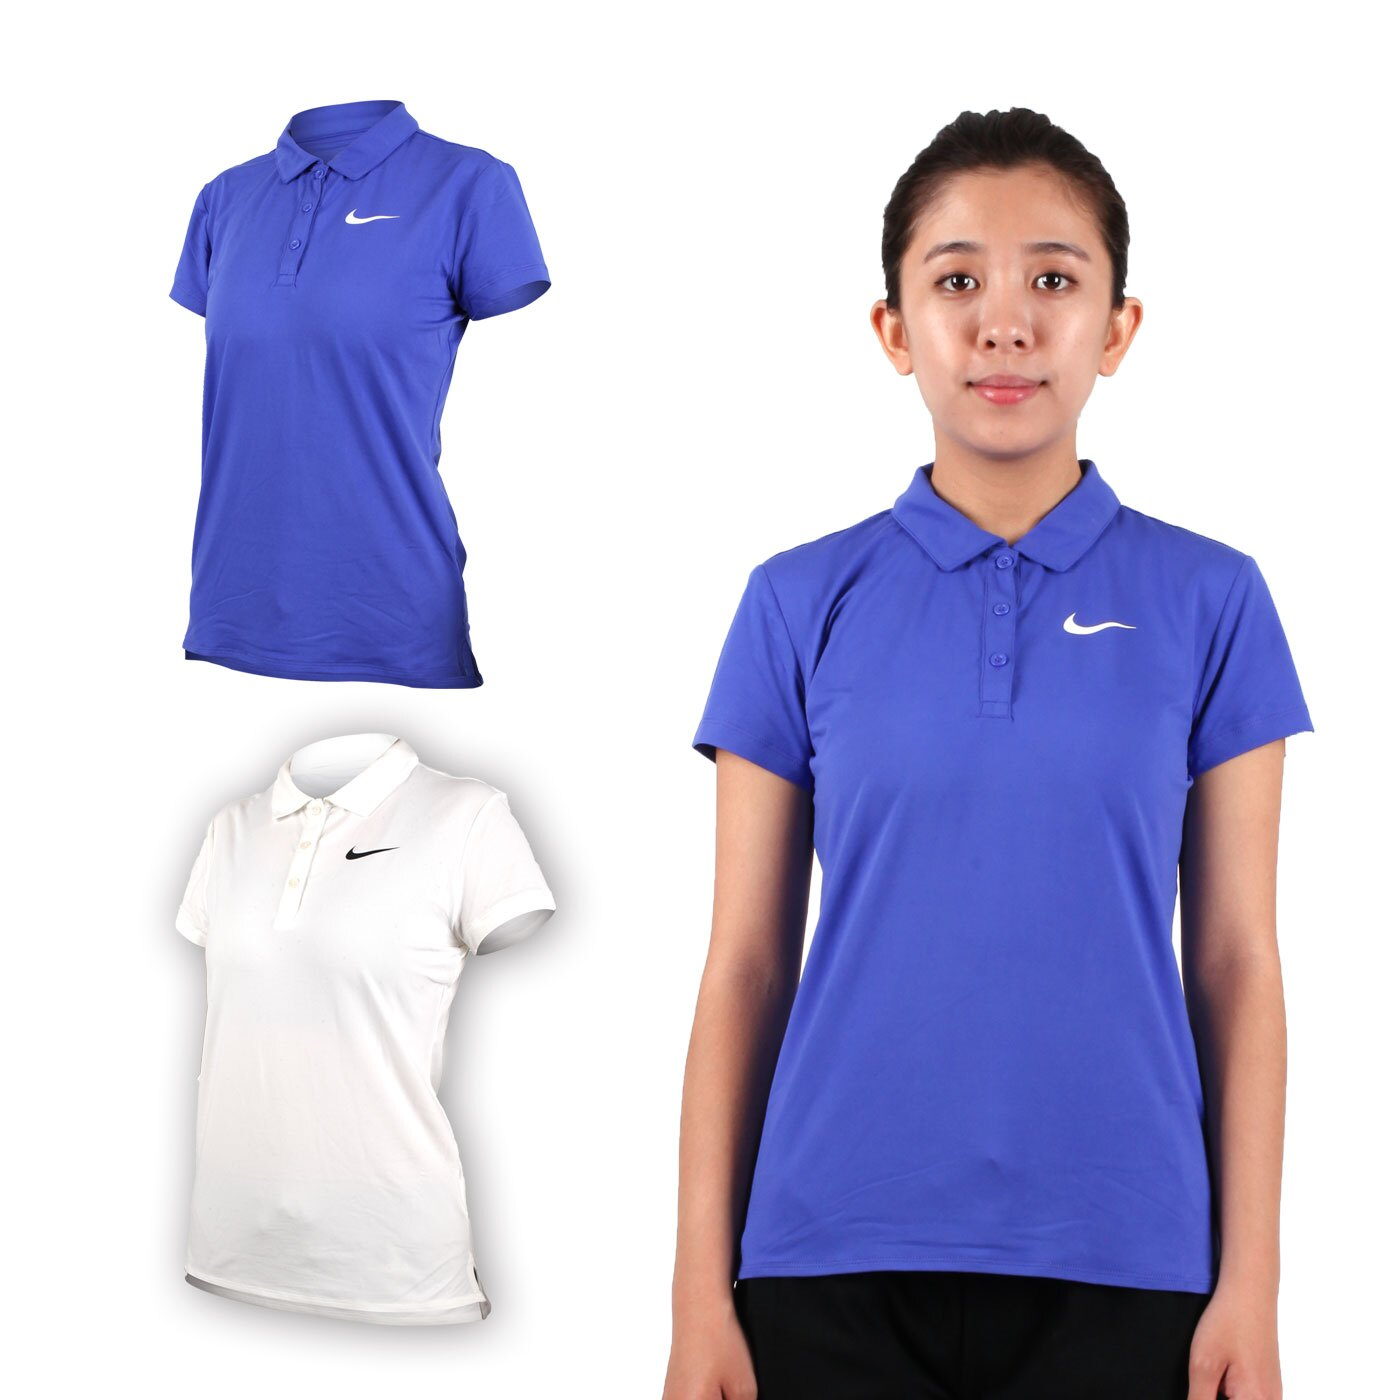 NIKE 女子短袖針織POLO衫(立領 慢跑 路跑【03312605】≡排汗專家≡